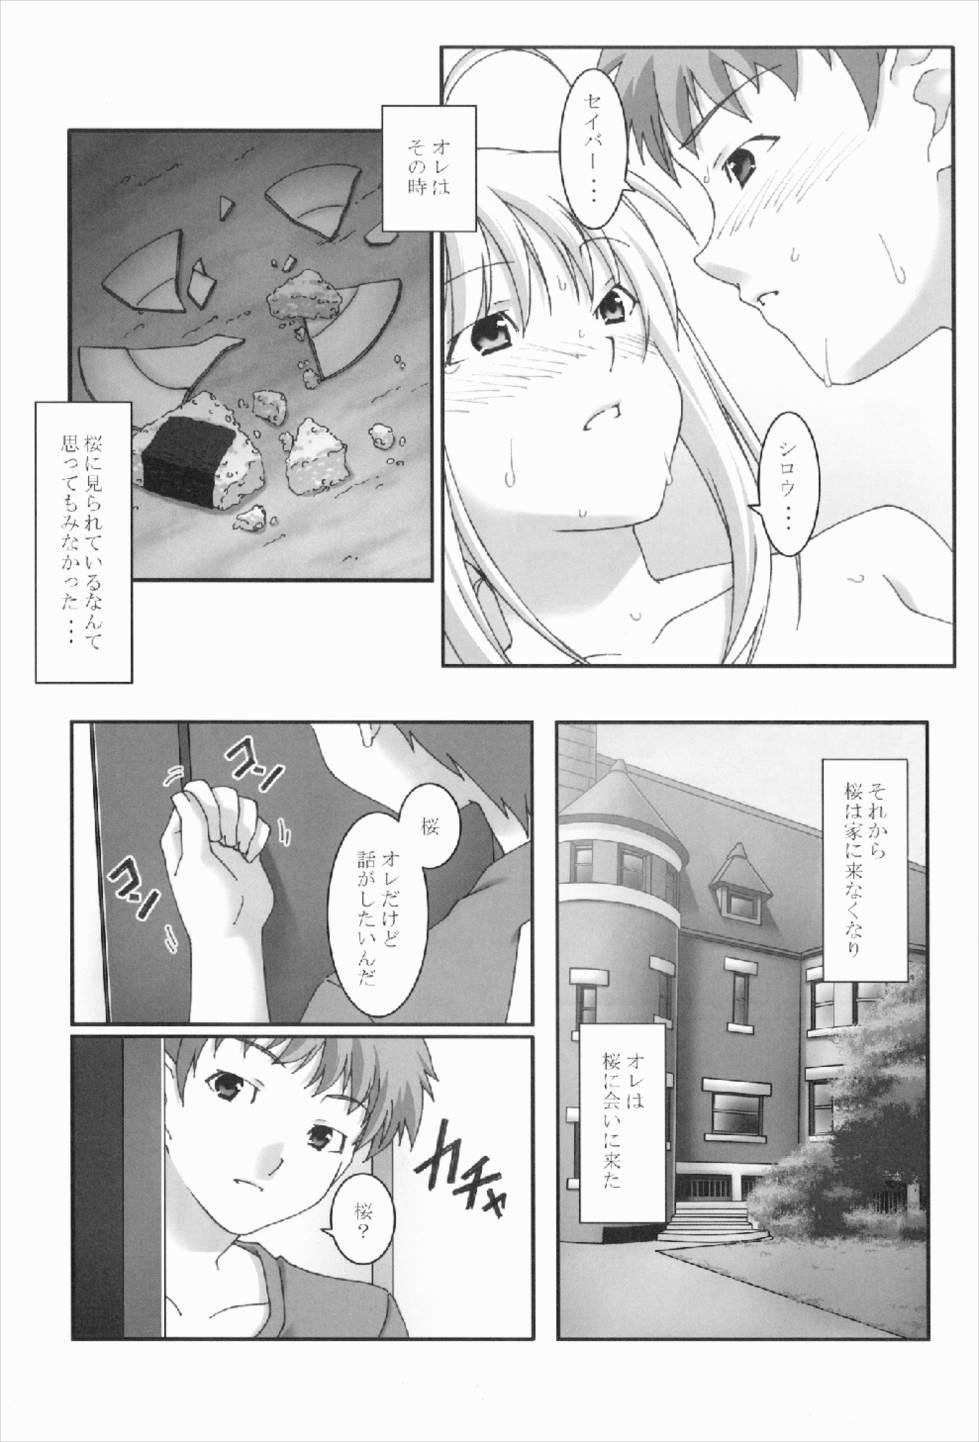 Anata no Soba ni Itai kara Vol. 3 8